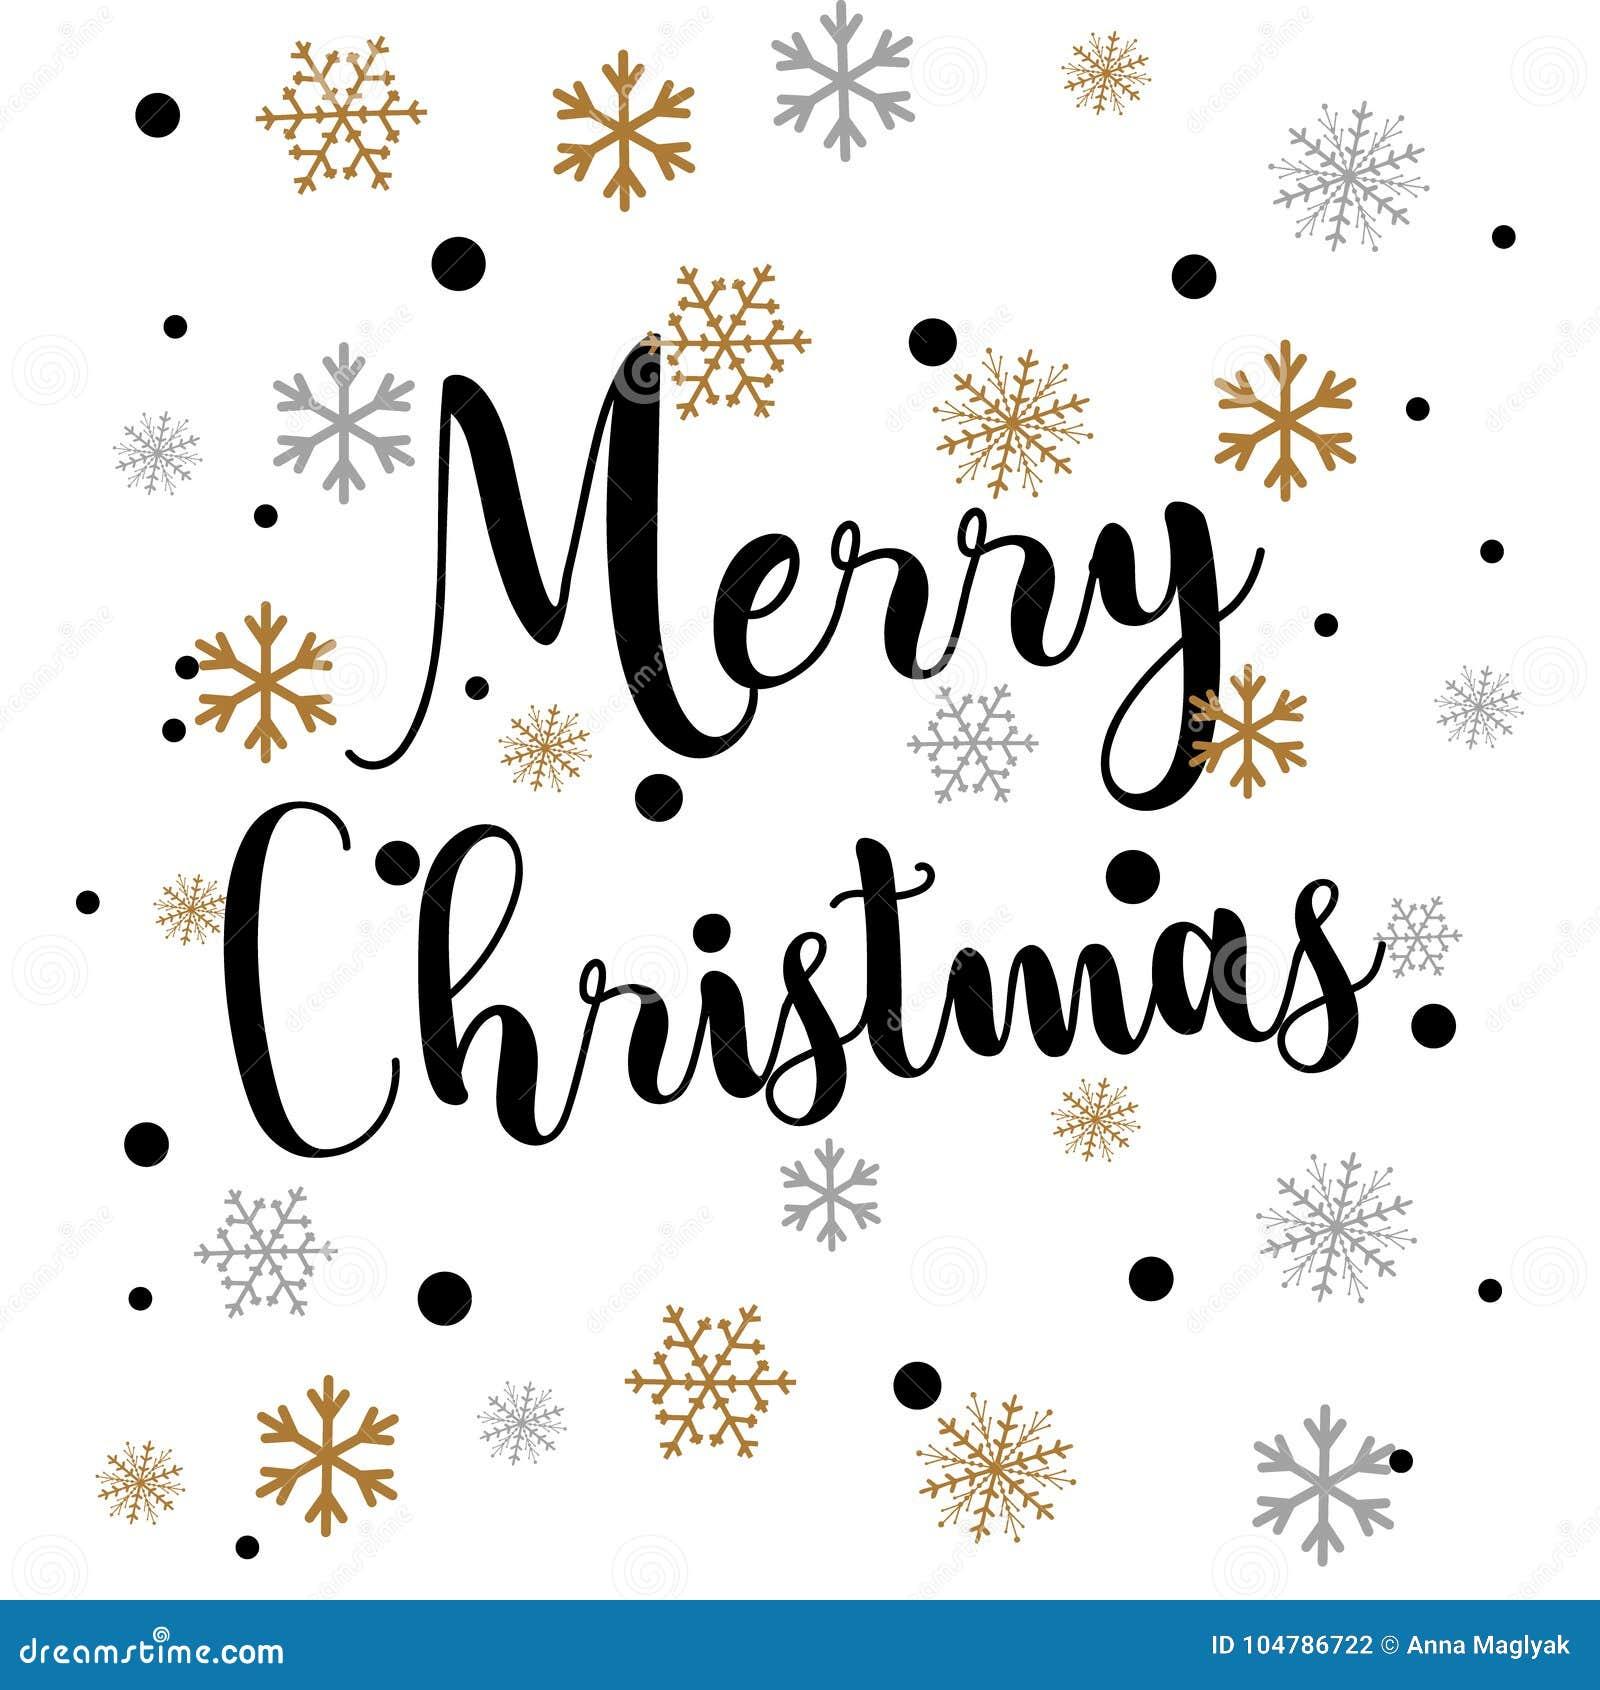 Retro Simple Christmas Card With Golden Snowflakes On White Stock ...